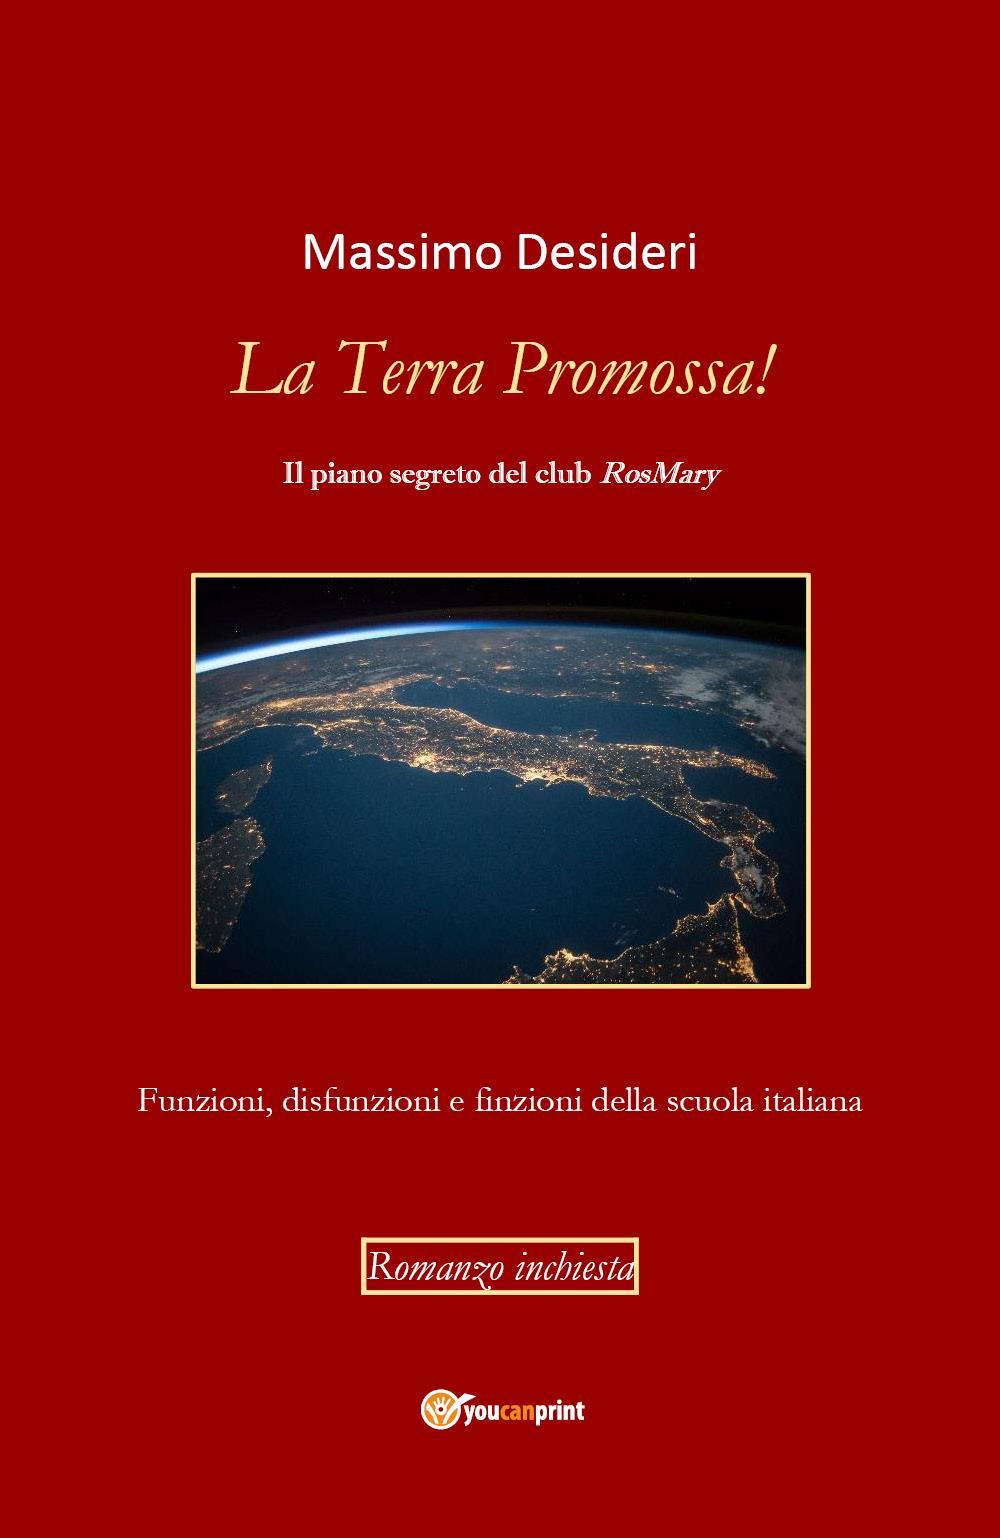 La Terra Promossa!